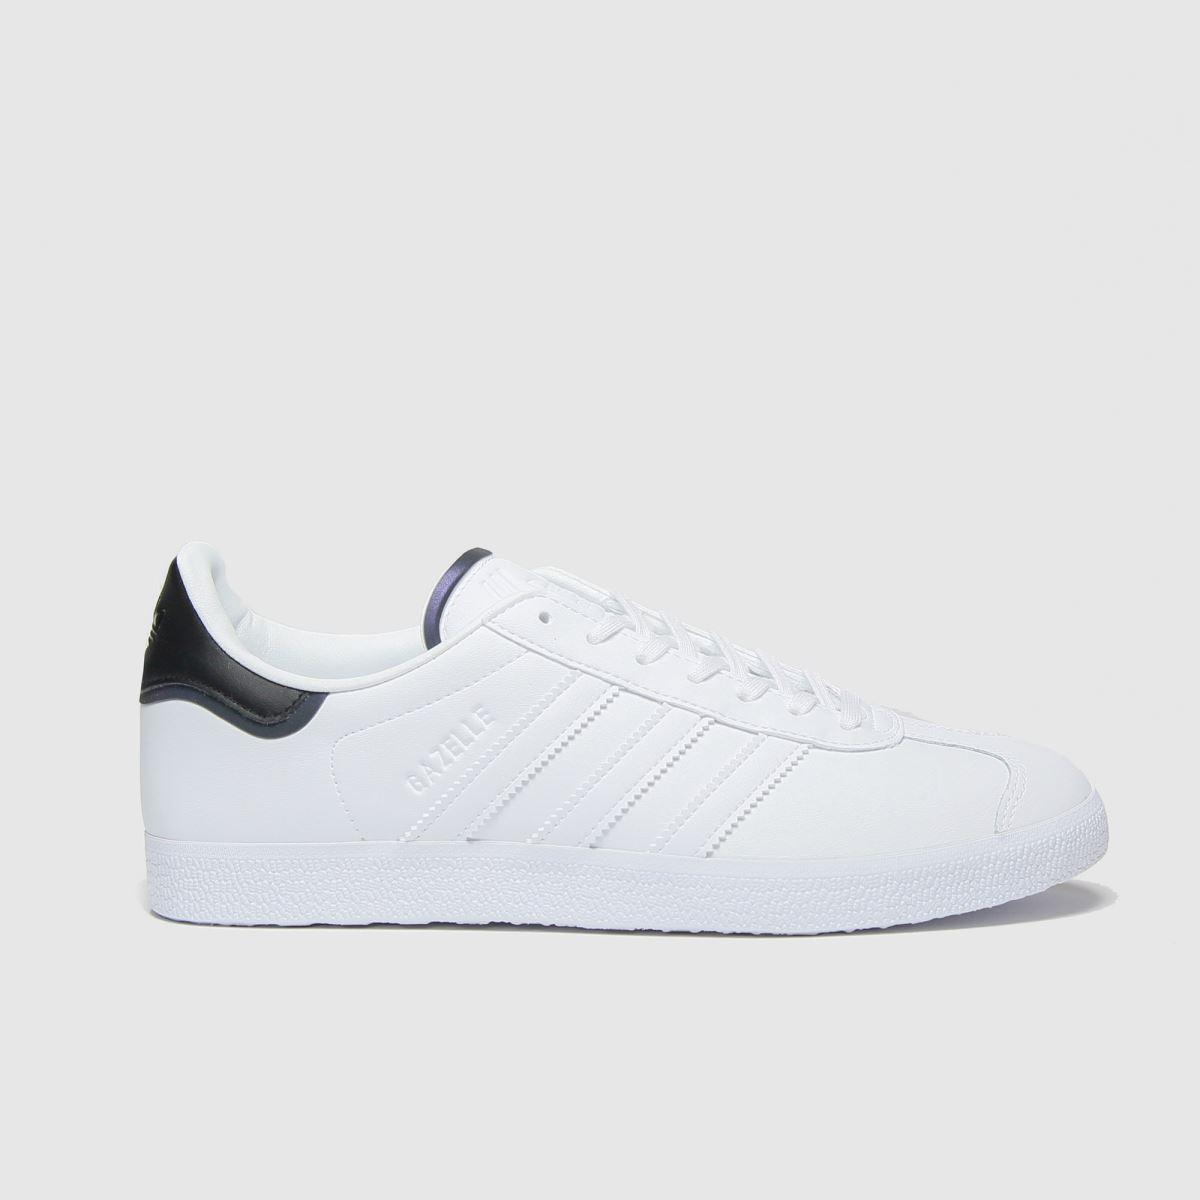 Adidas White & Black Gazelle Trainers